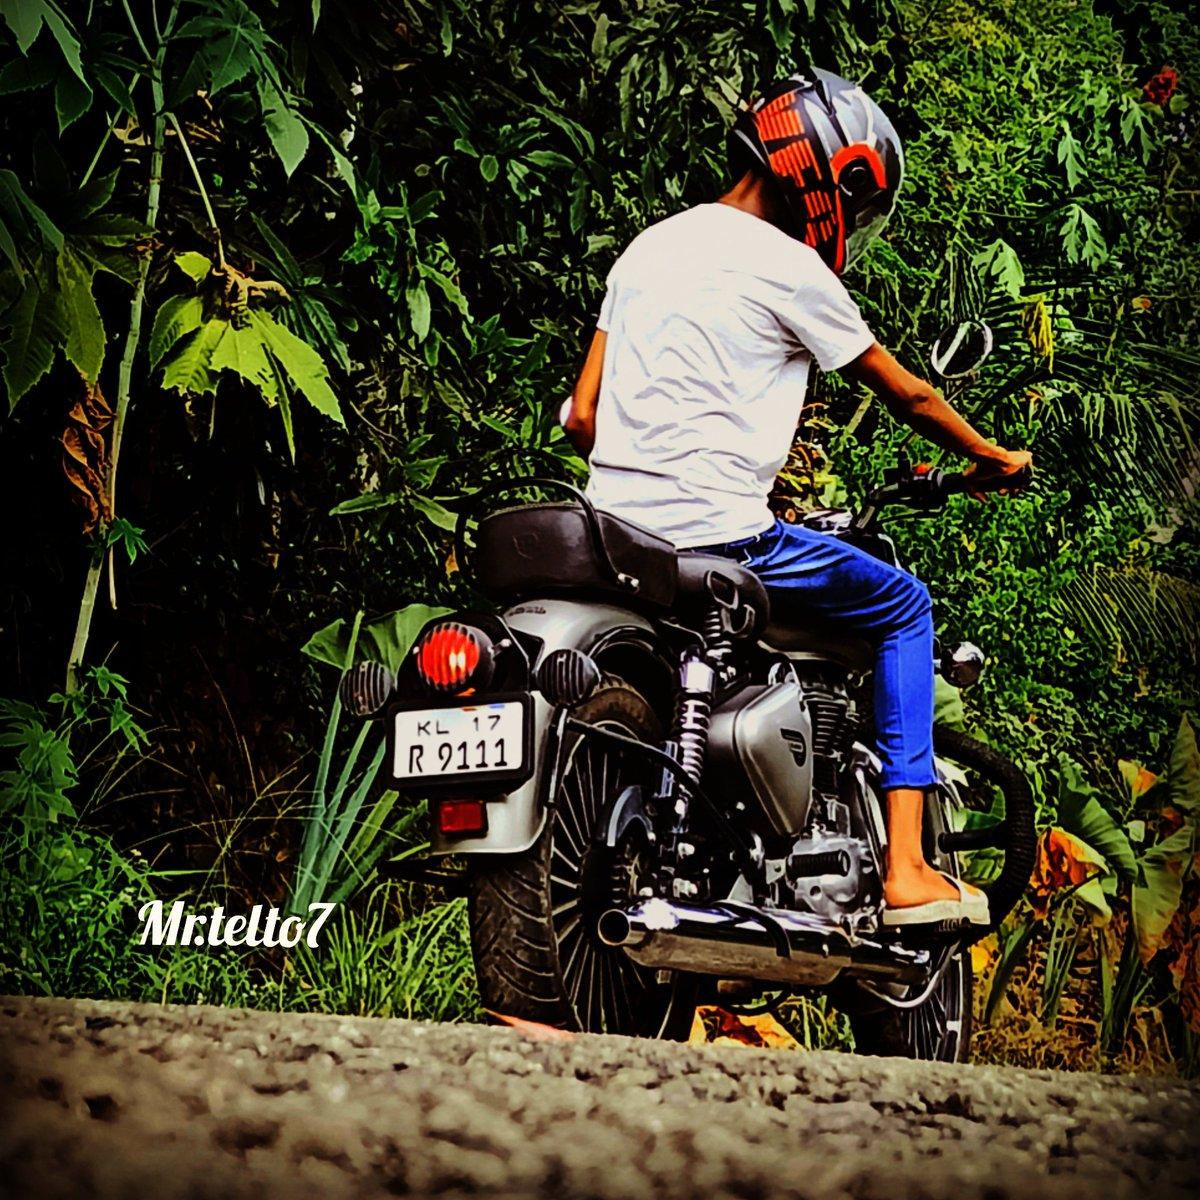 It's not a phase IT'S MY LIFE it's not a hobby IT'S MY PASSION it's not for everyone IT'S FOR ME #KTM #ktmrc200 #ktmindia  #bikersgram #ktmofficial #dukeoffIcial #autolougedesign #bikergram #bikerchick #wearthespeed #jeevanulla_page #pdarmy #superbikes #superbikesindia #superbikepic.twitter.com/TuISsEGIOn